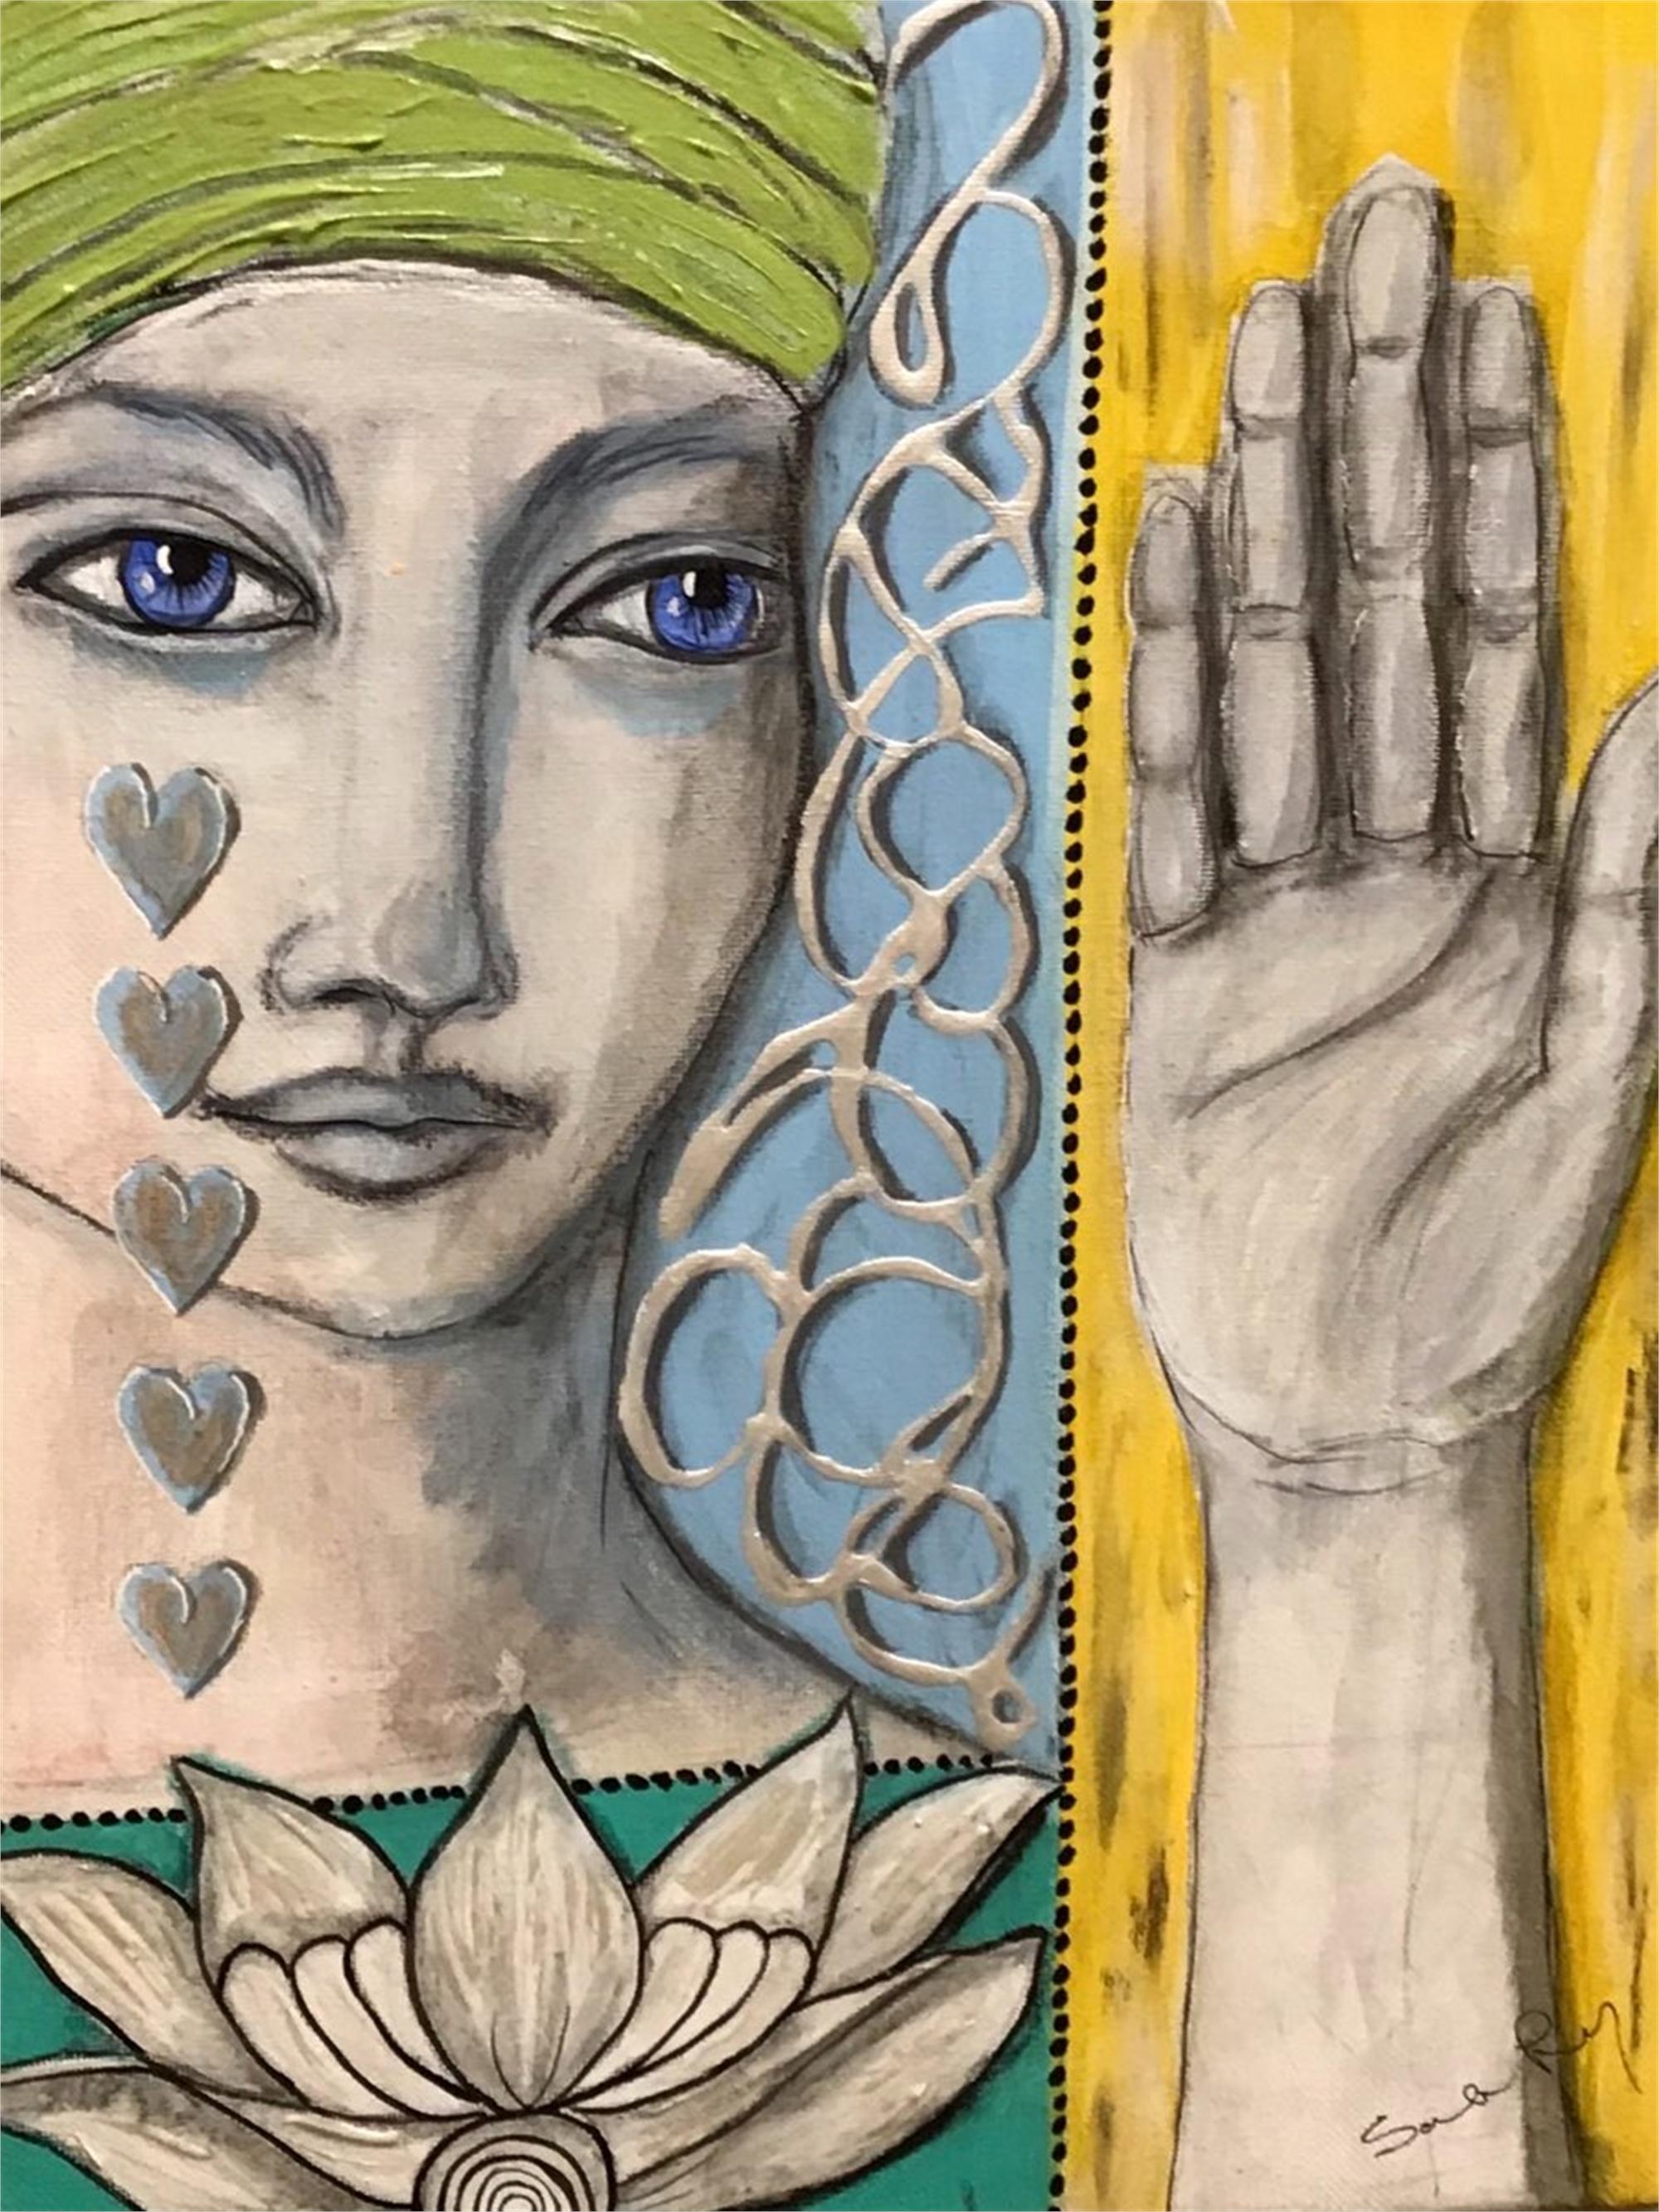 Lotus in Hand by Sarah Long